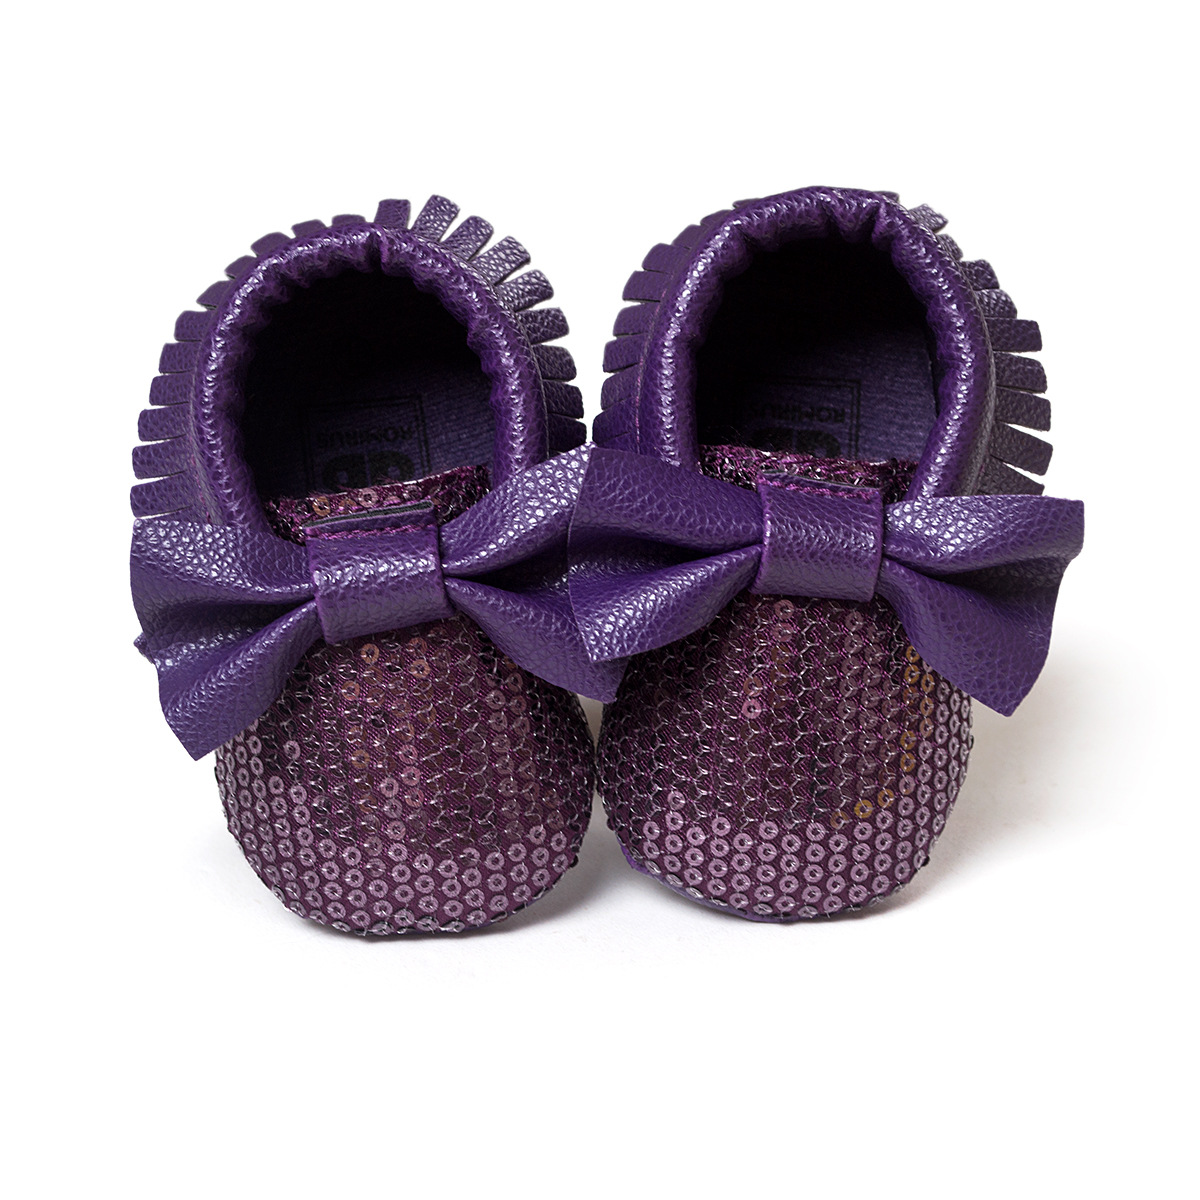 ᗜ LjഃArco púrpura Zapatos de bebé niños chica cuero Zapatos pu ...